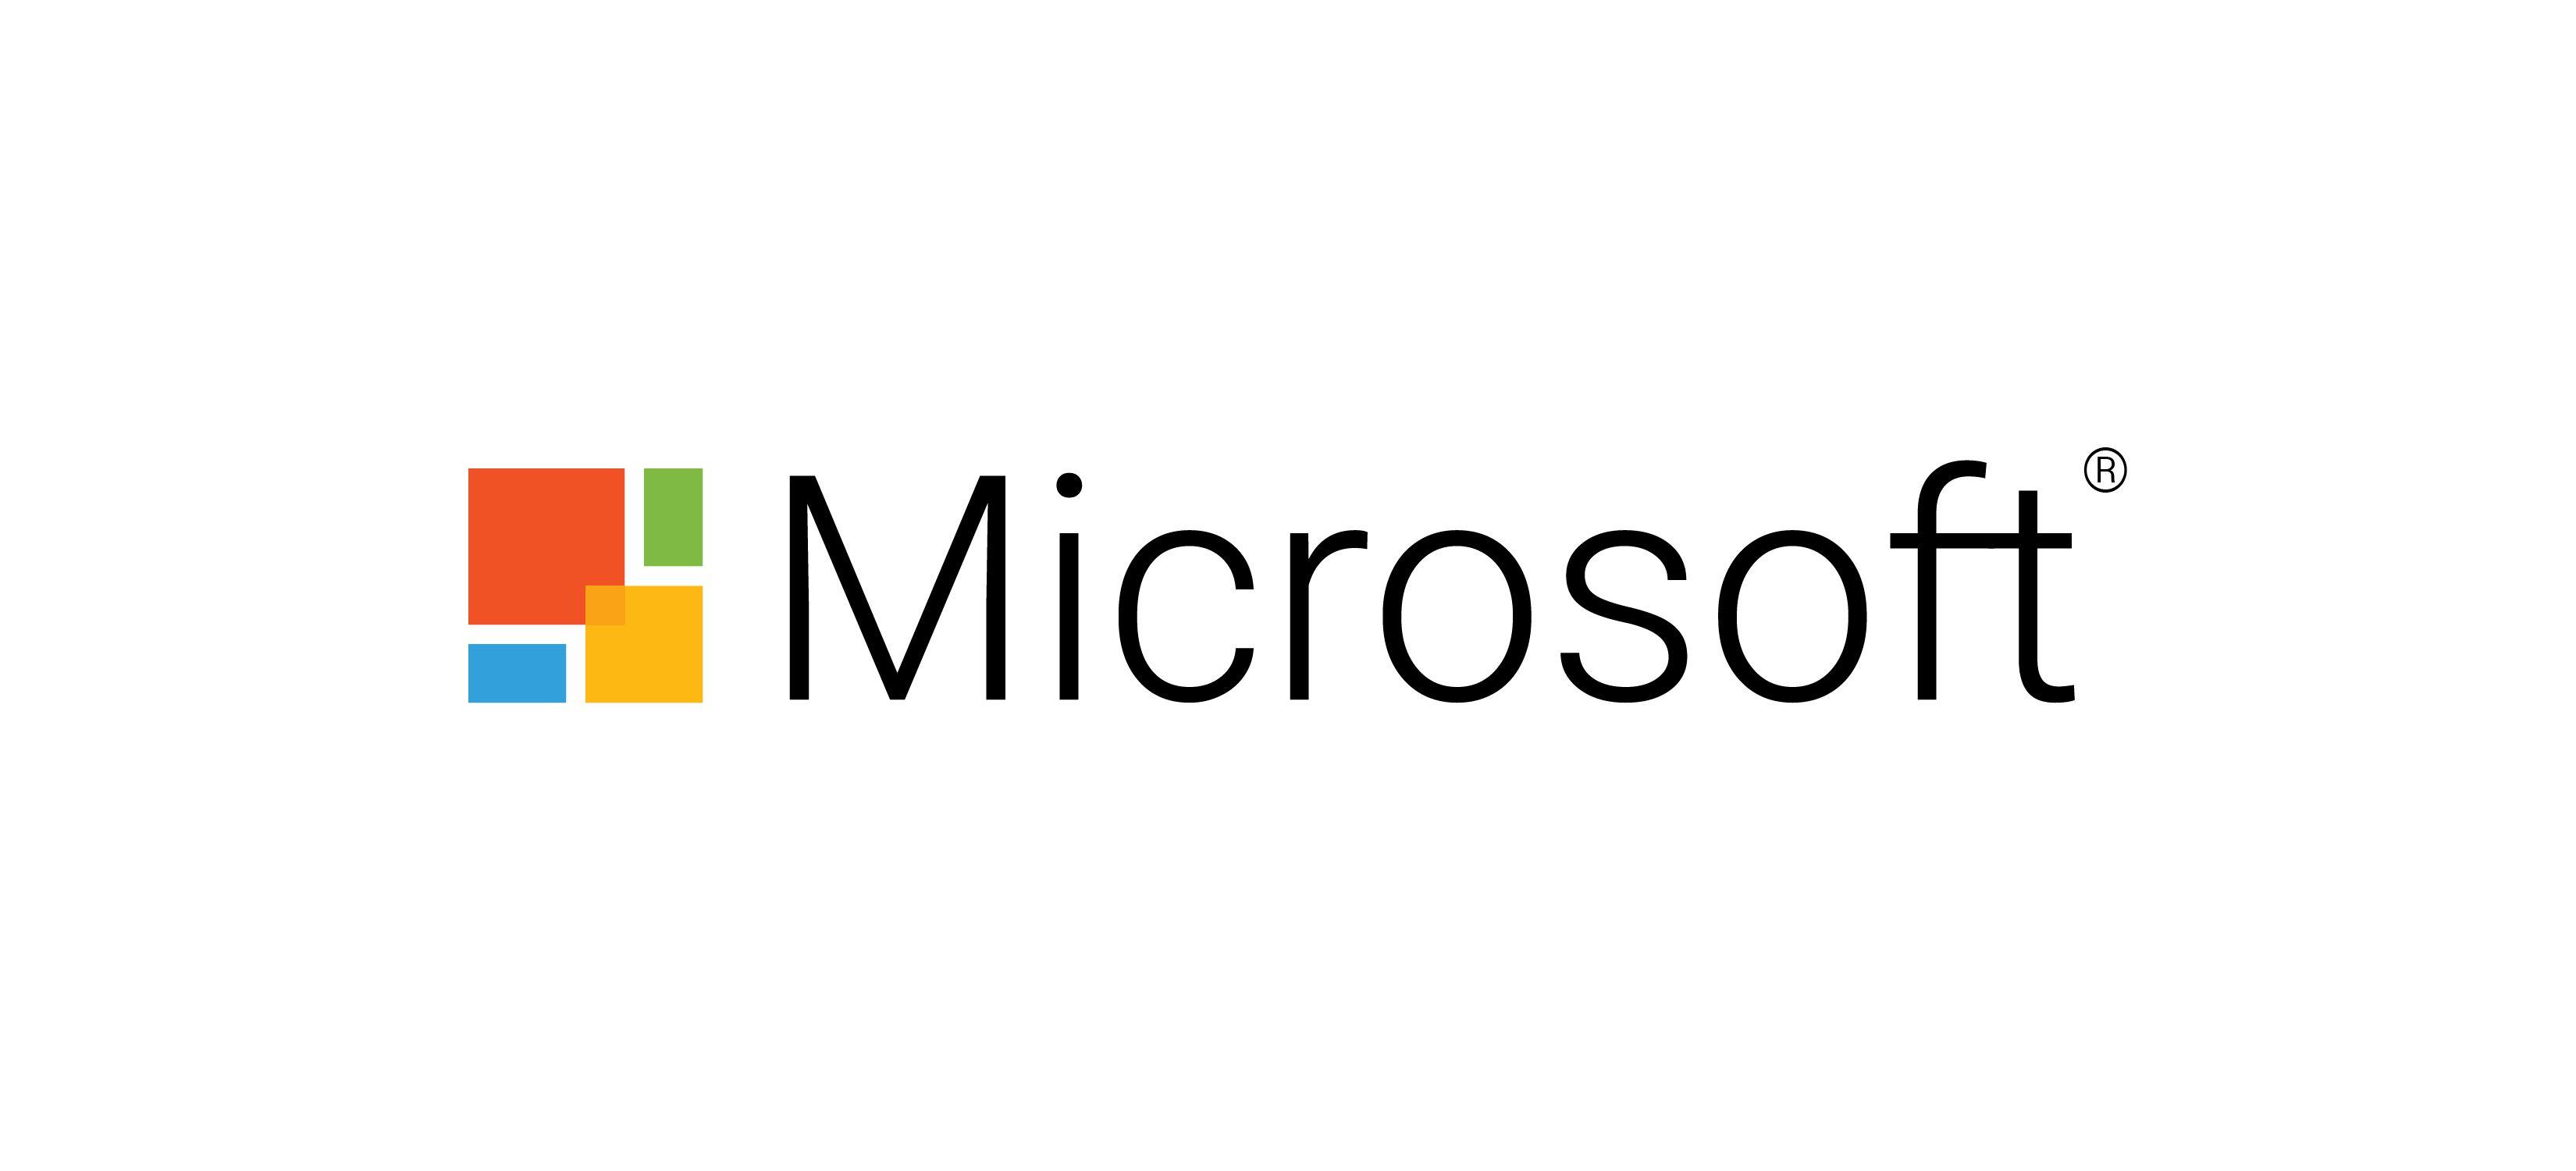 Microsoft 2018 logo design windows microsoft pinterest microsoft microsoft 2018 fandeluxe Choice Image